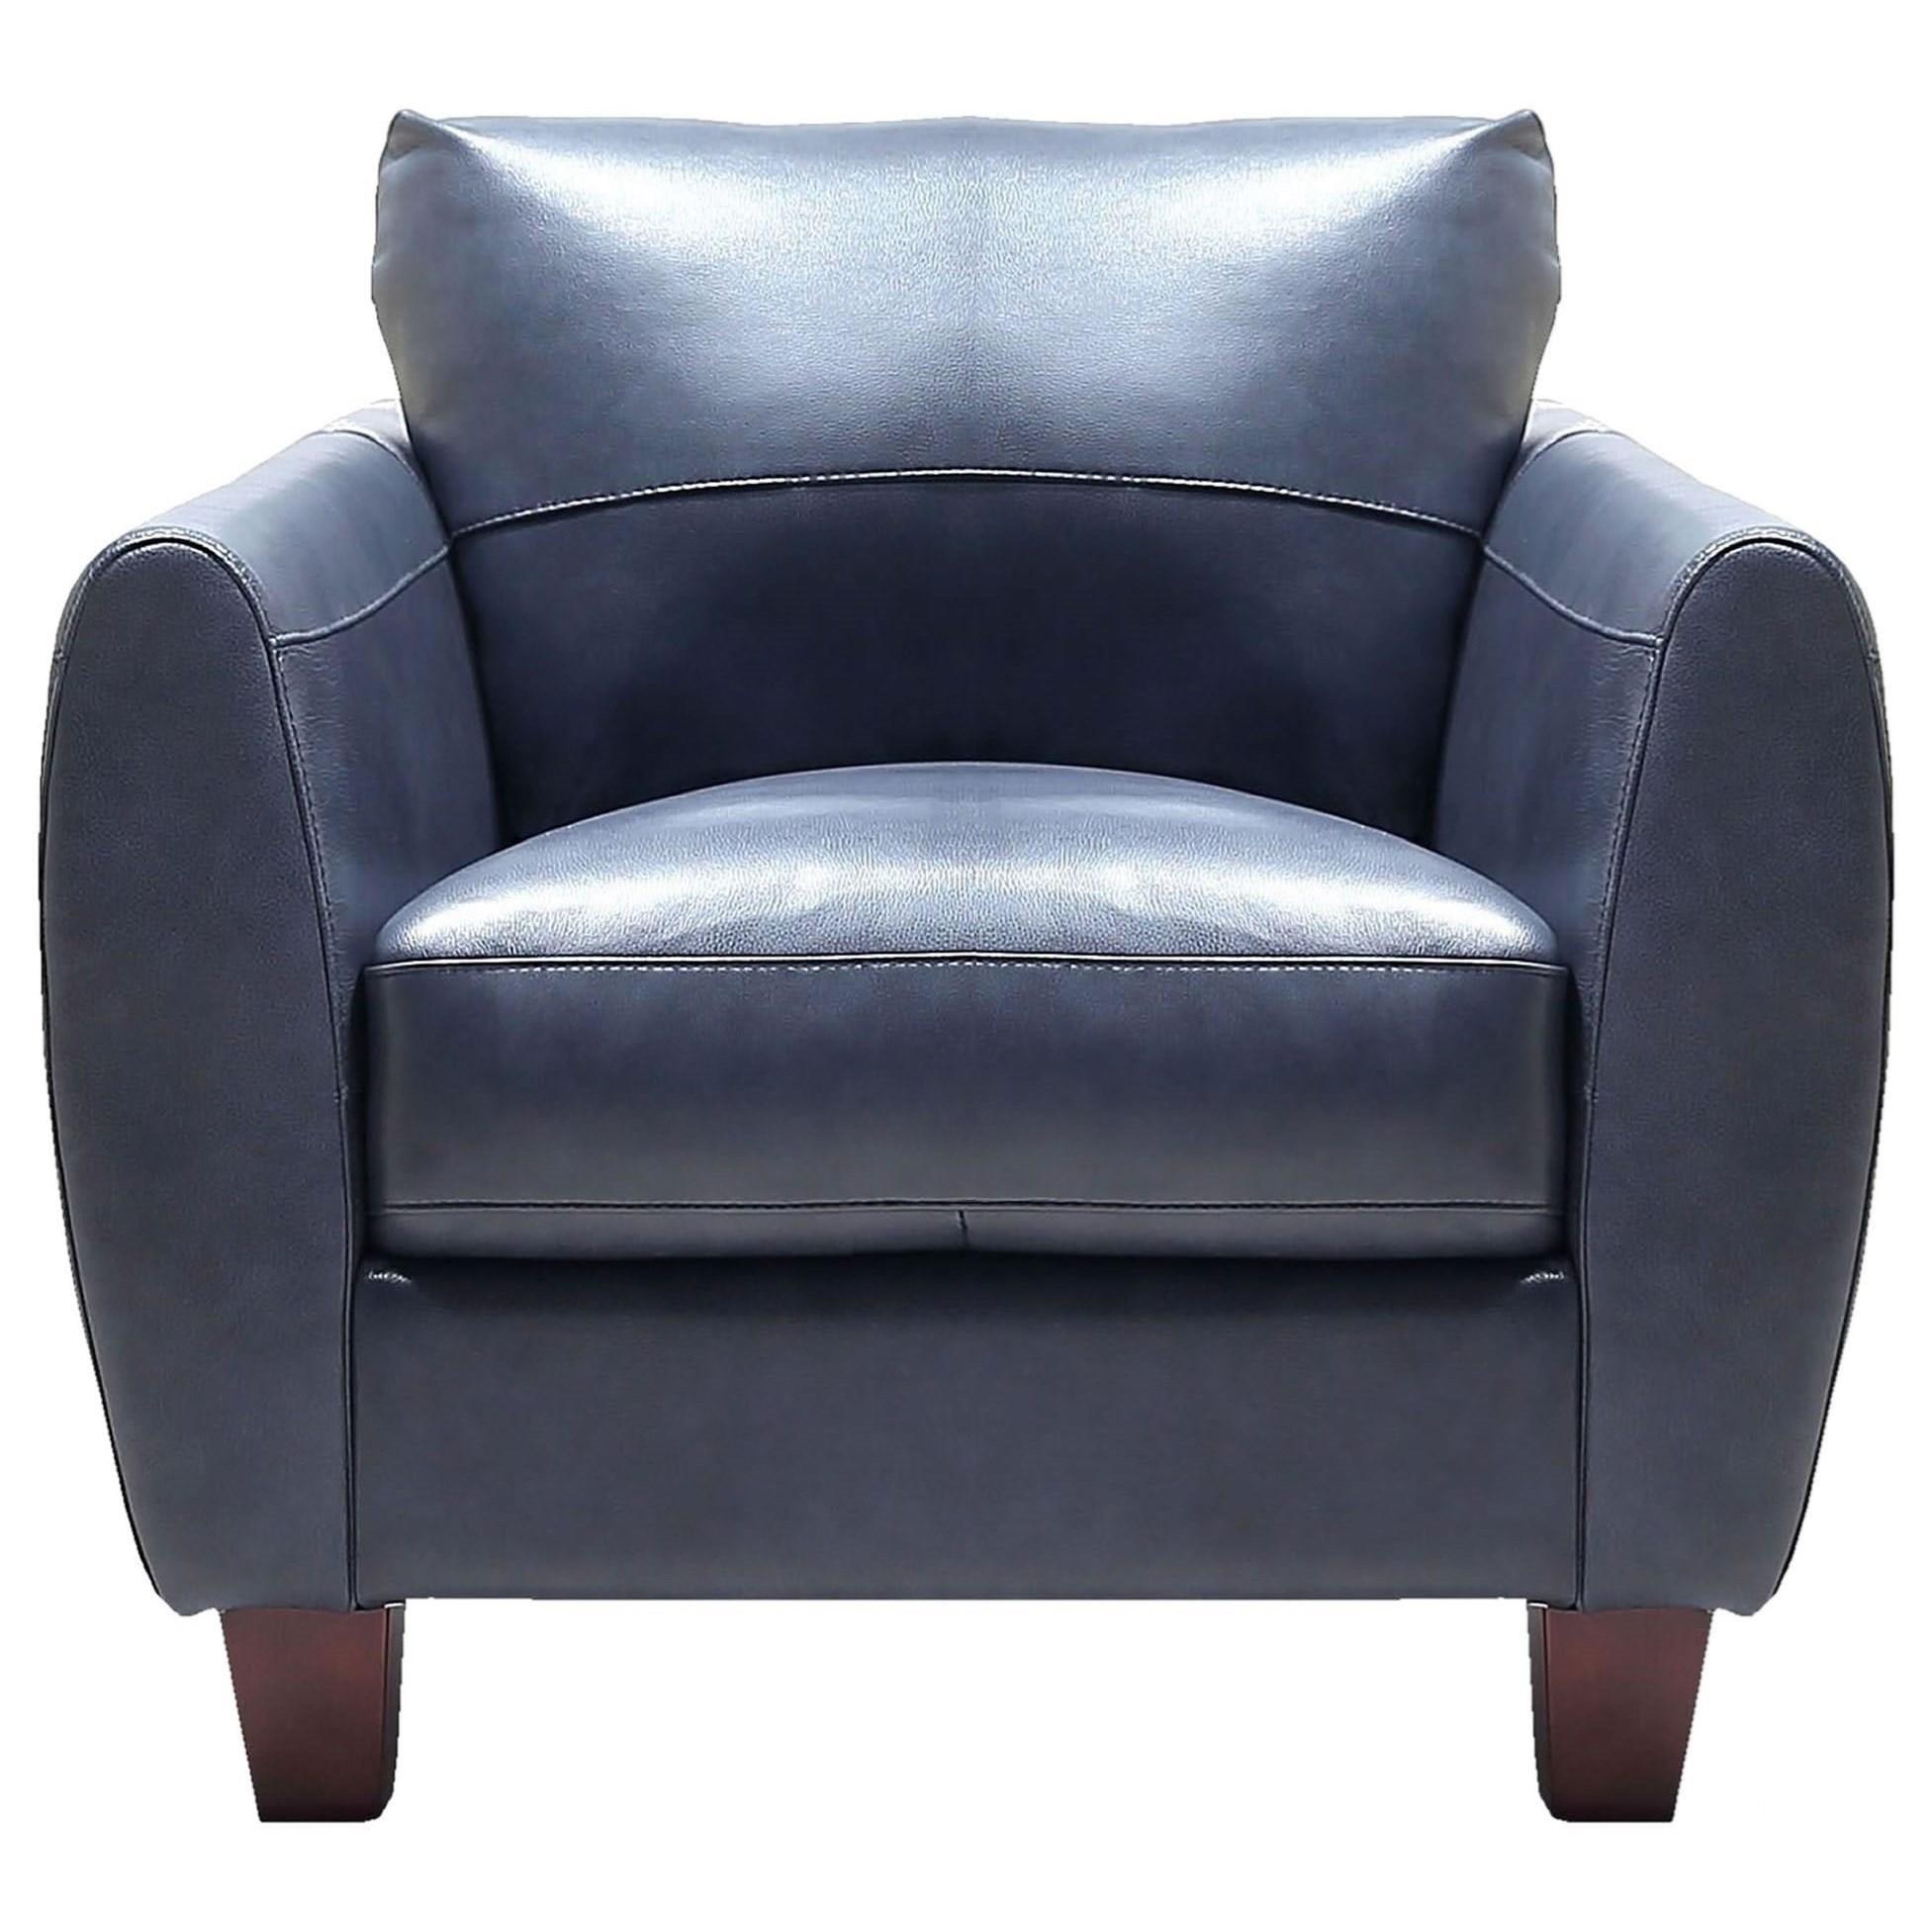 Traverse Chair at Rotmans